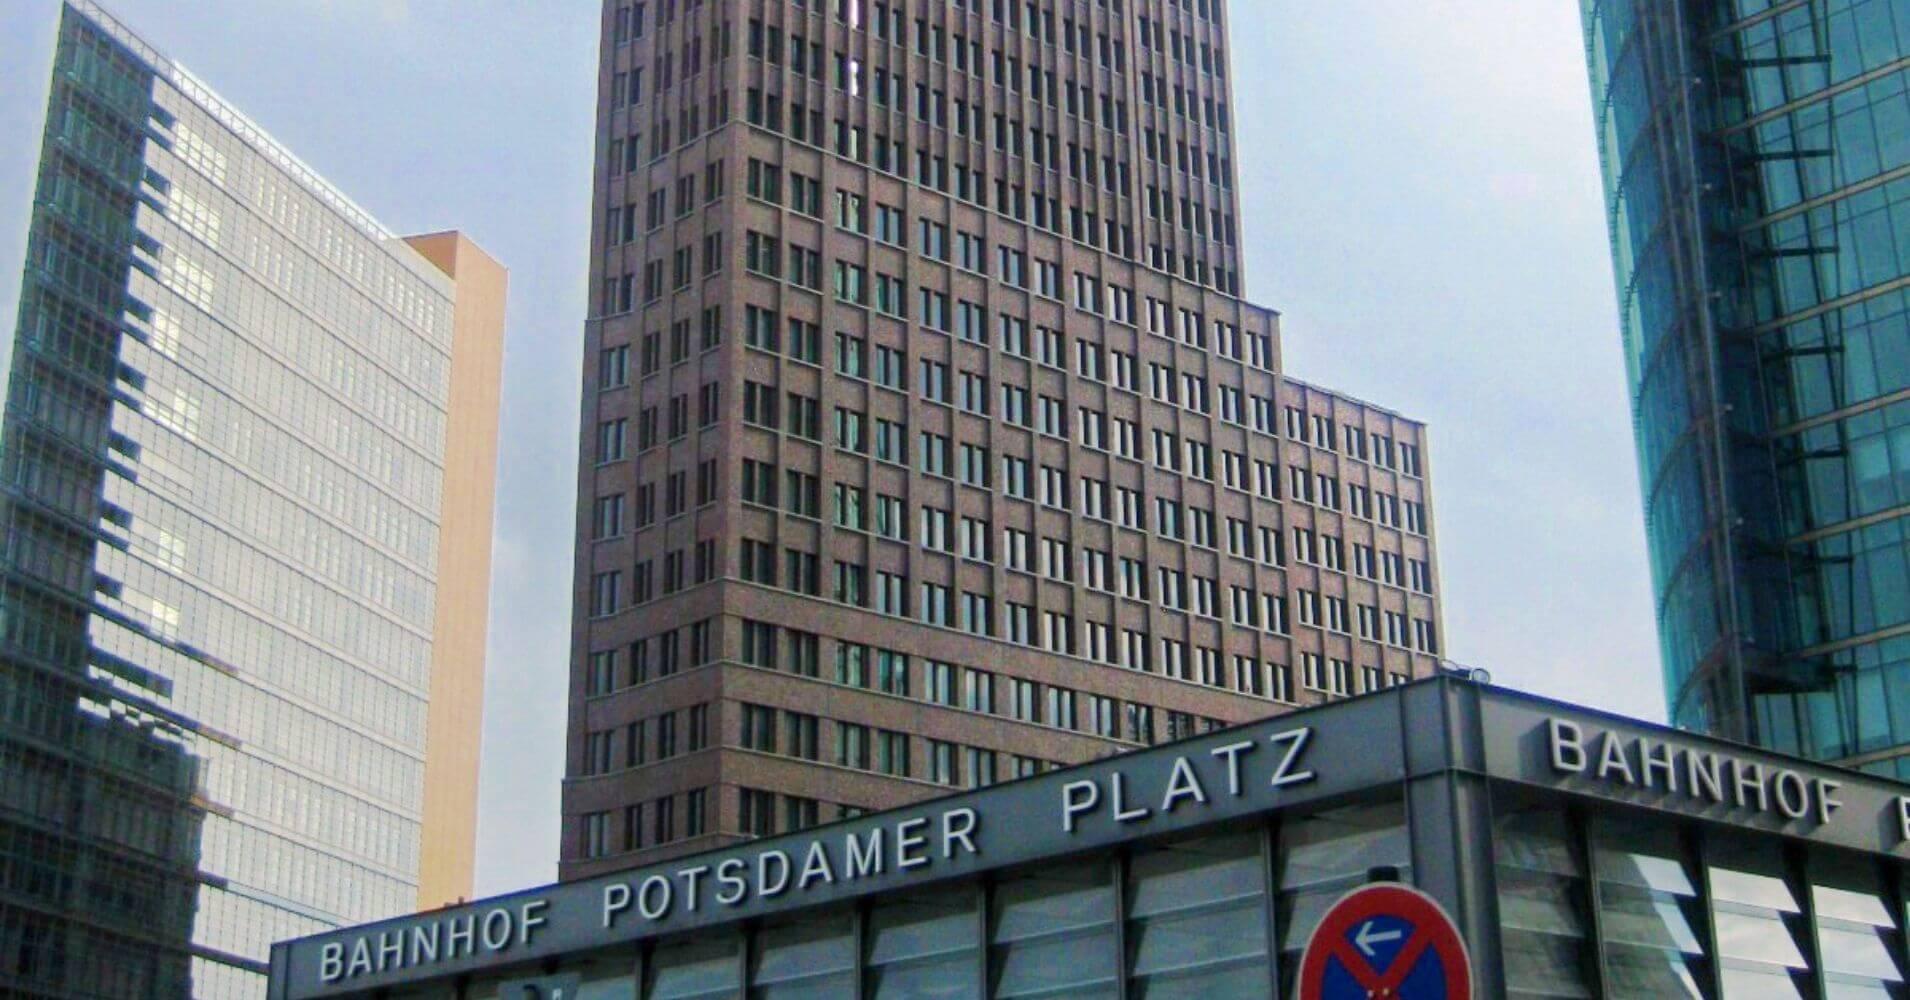 Potsdamer Platz. Viaje a Berlín. Alemania.